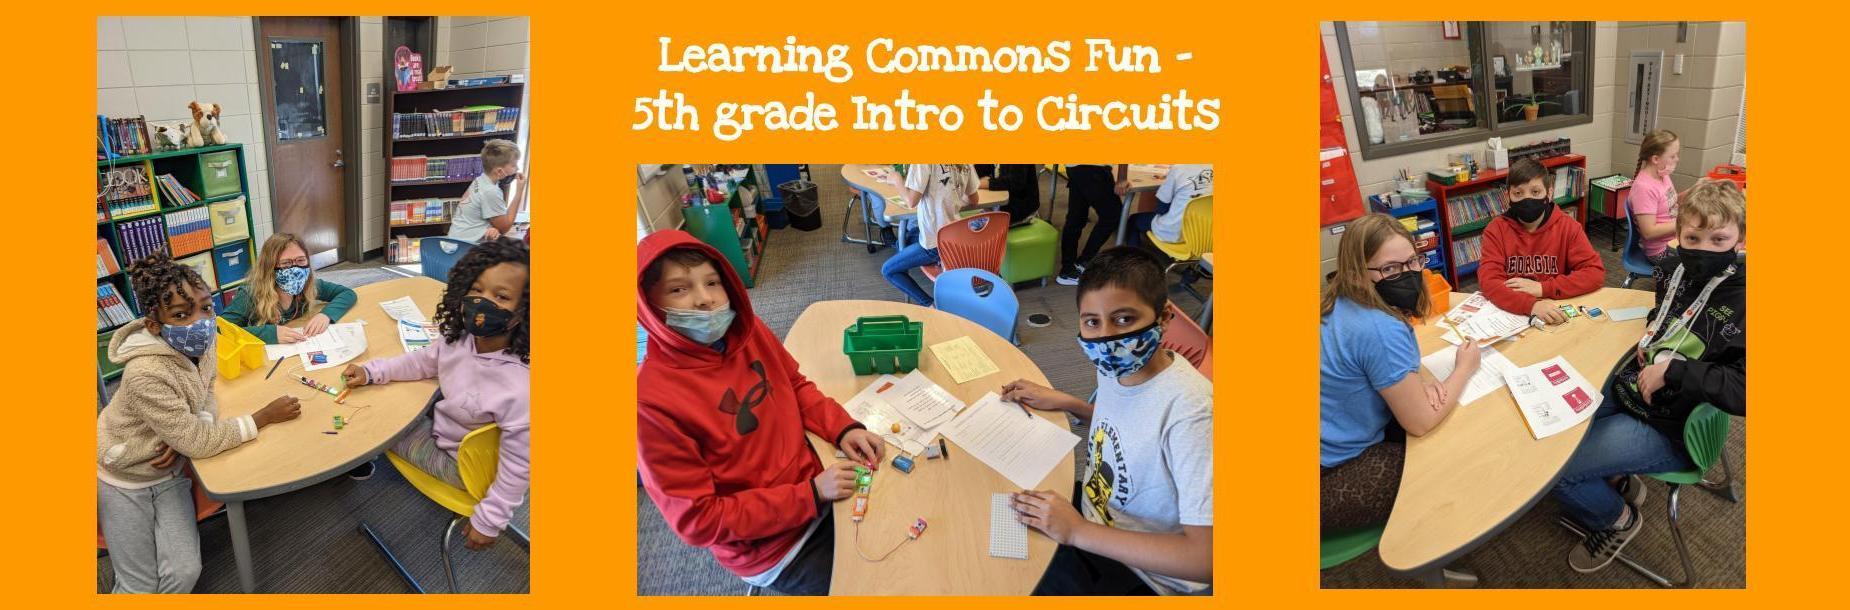 littleBits Circuits